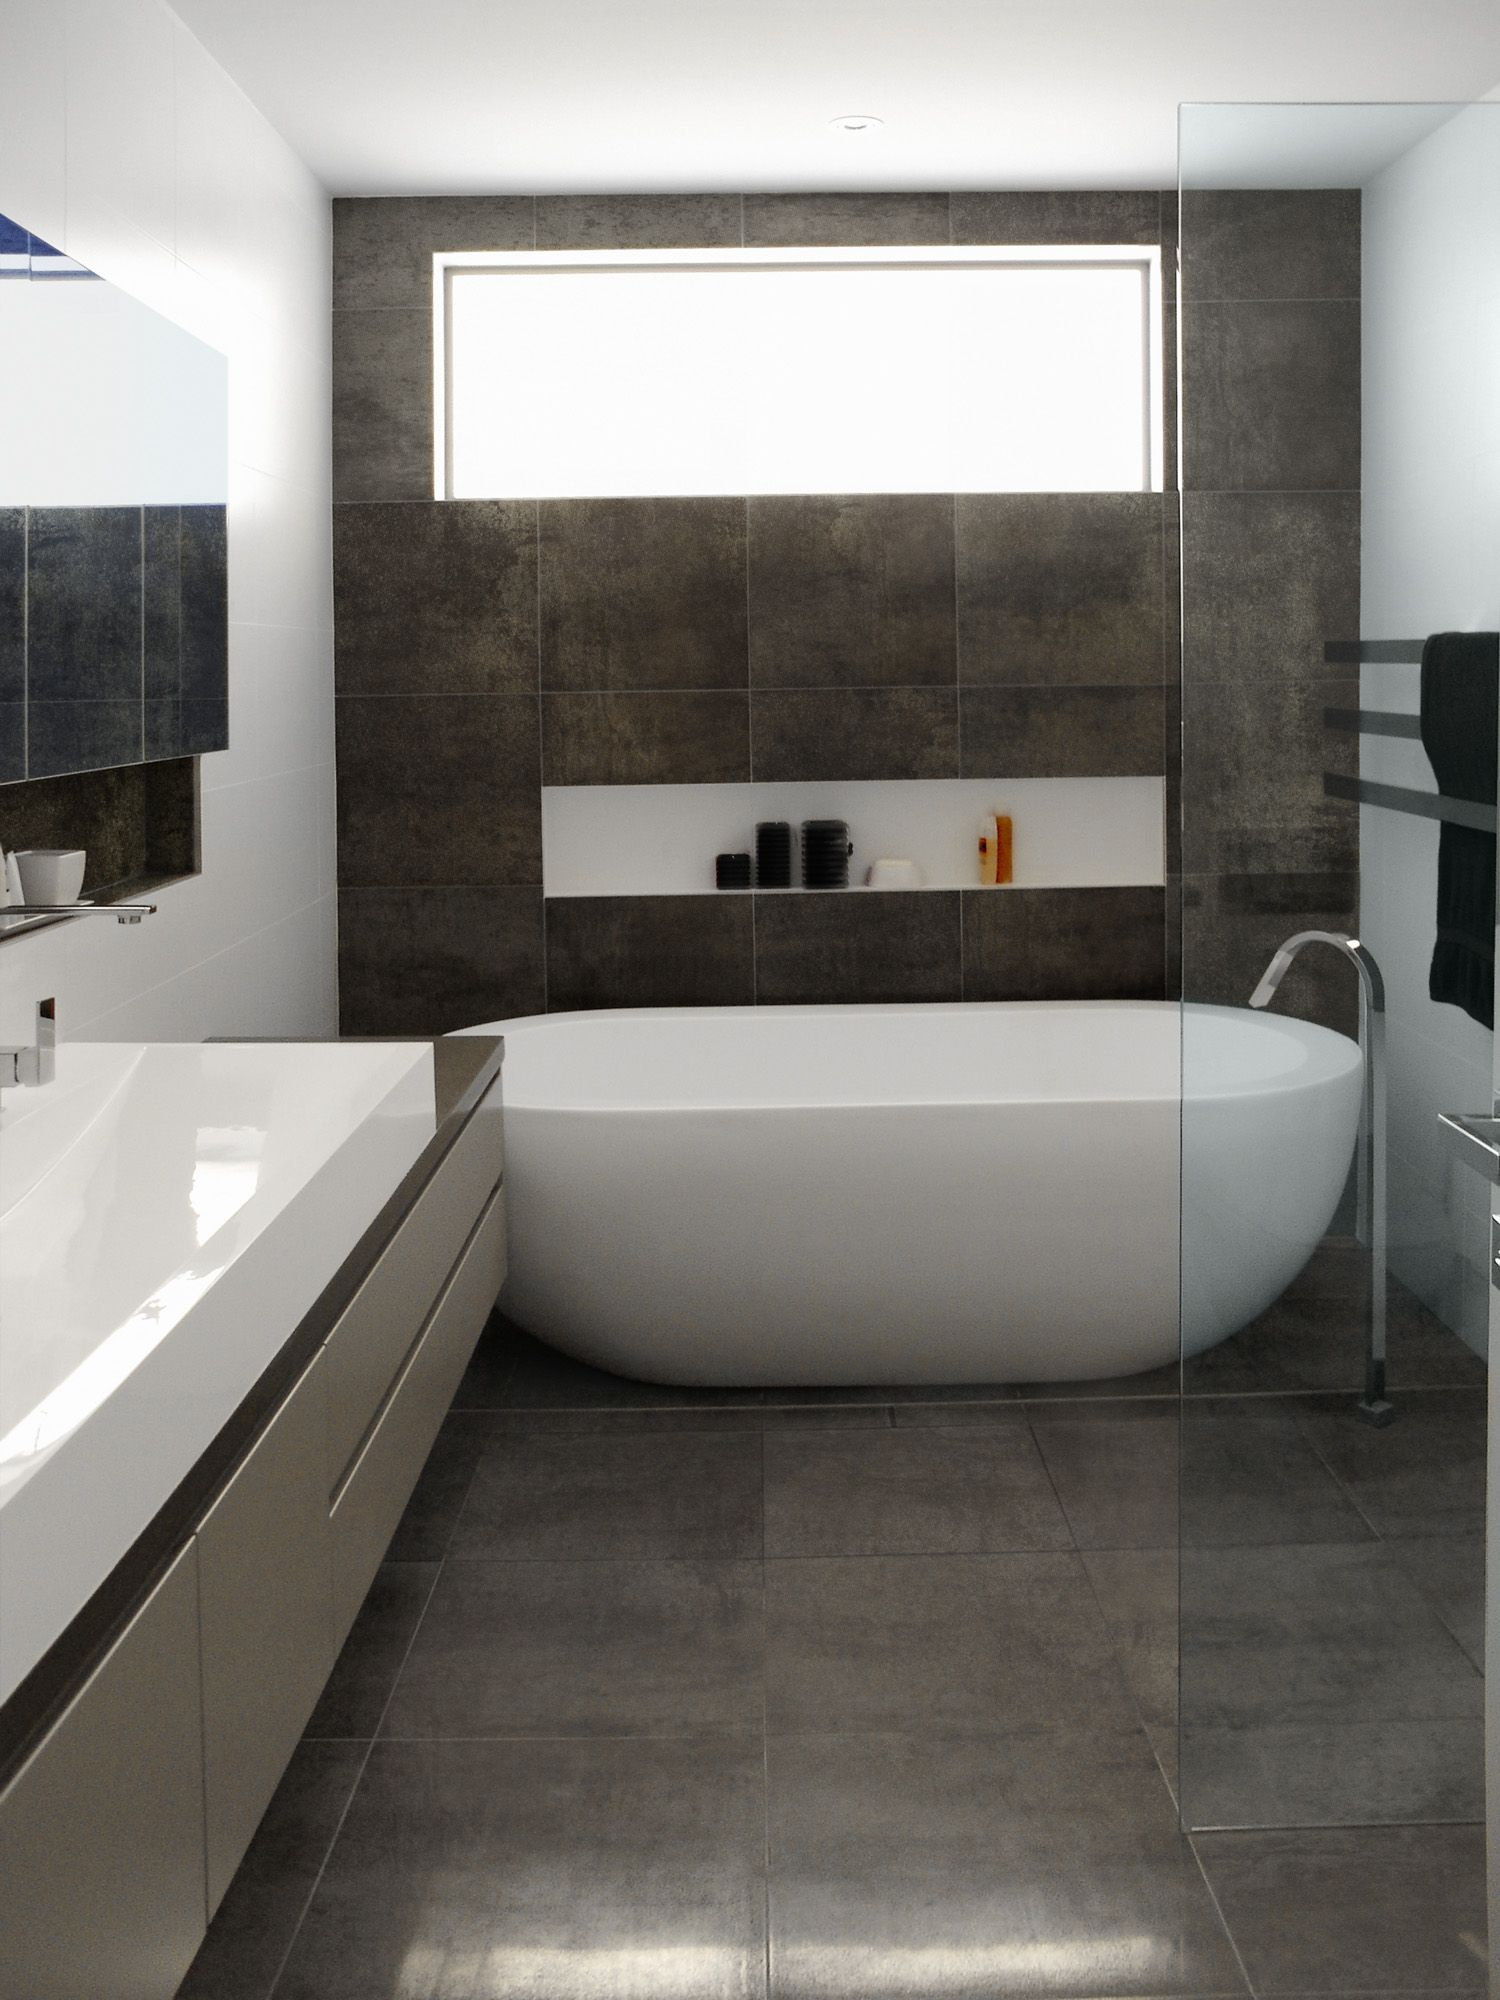 excellent grey white modern bathroom tile ideas | Nice Oval Freestanding Soaker Bathtubs On Grey Tile Floors ...